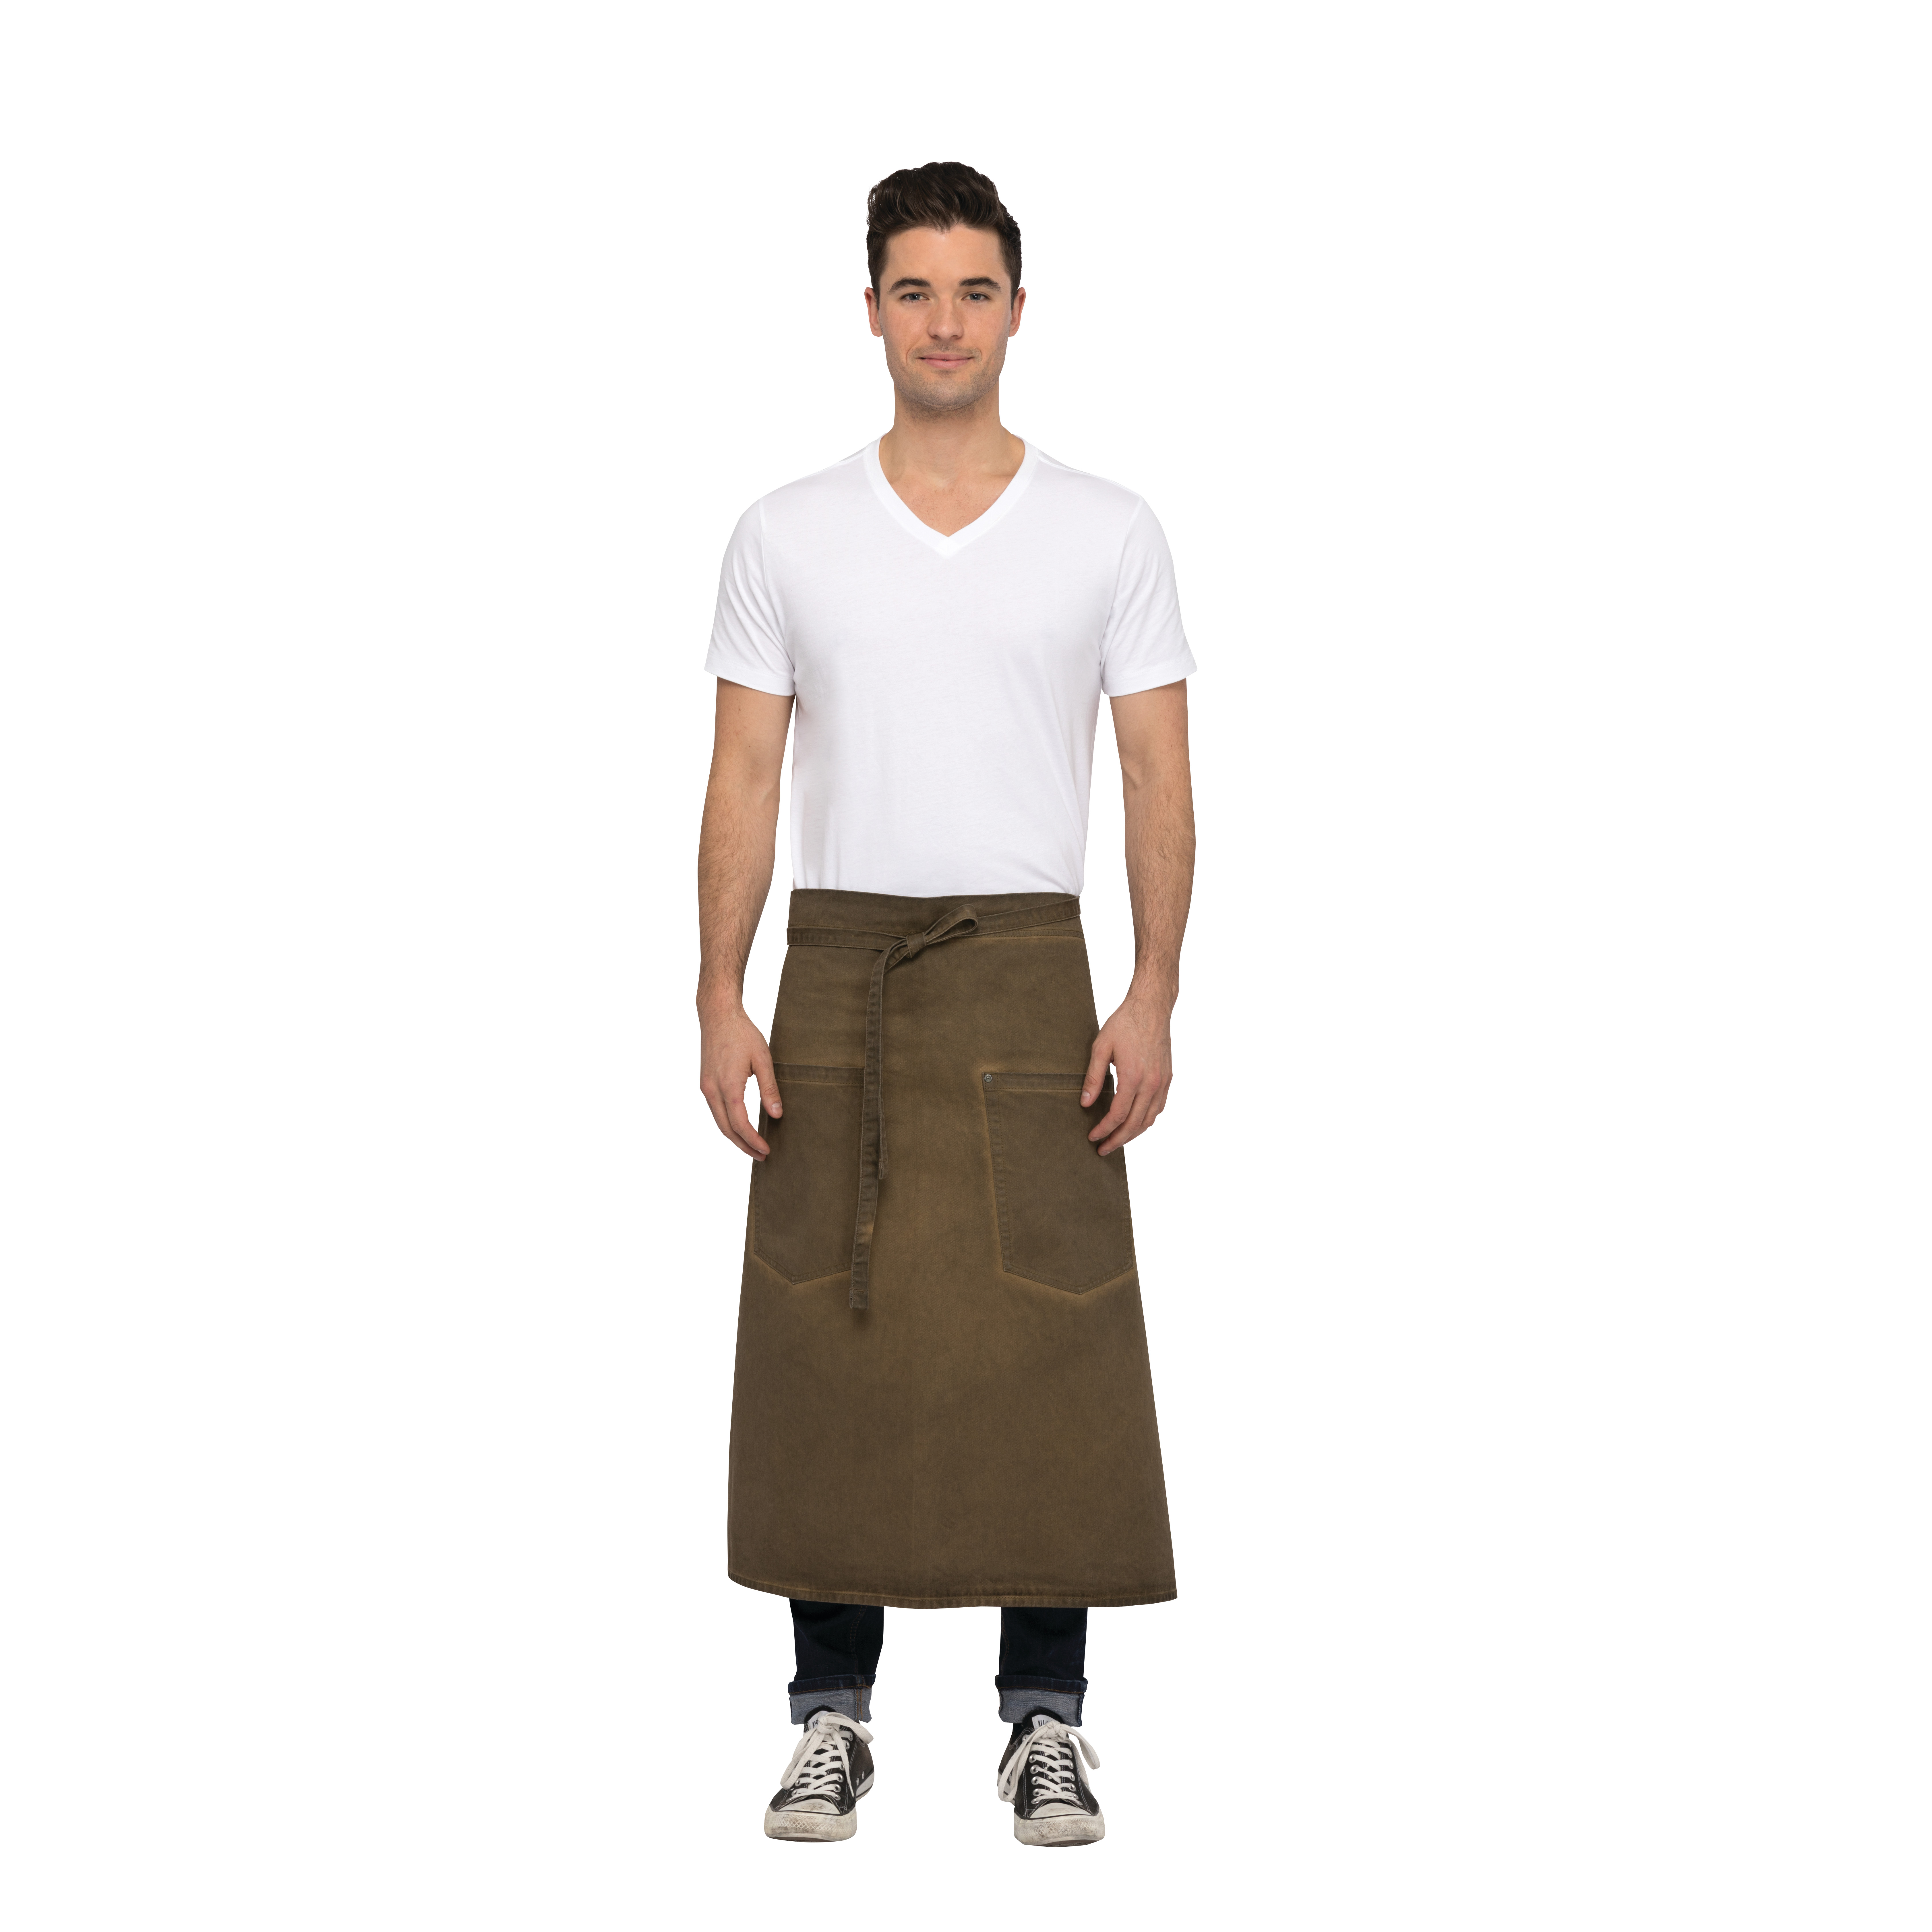 Chef Works ALWAQ024GBN0 waist apron